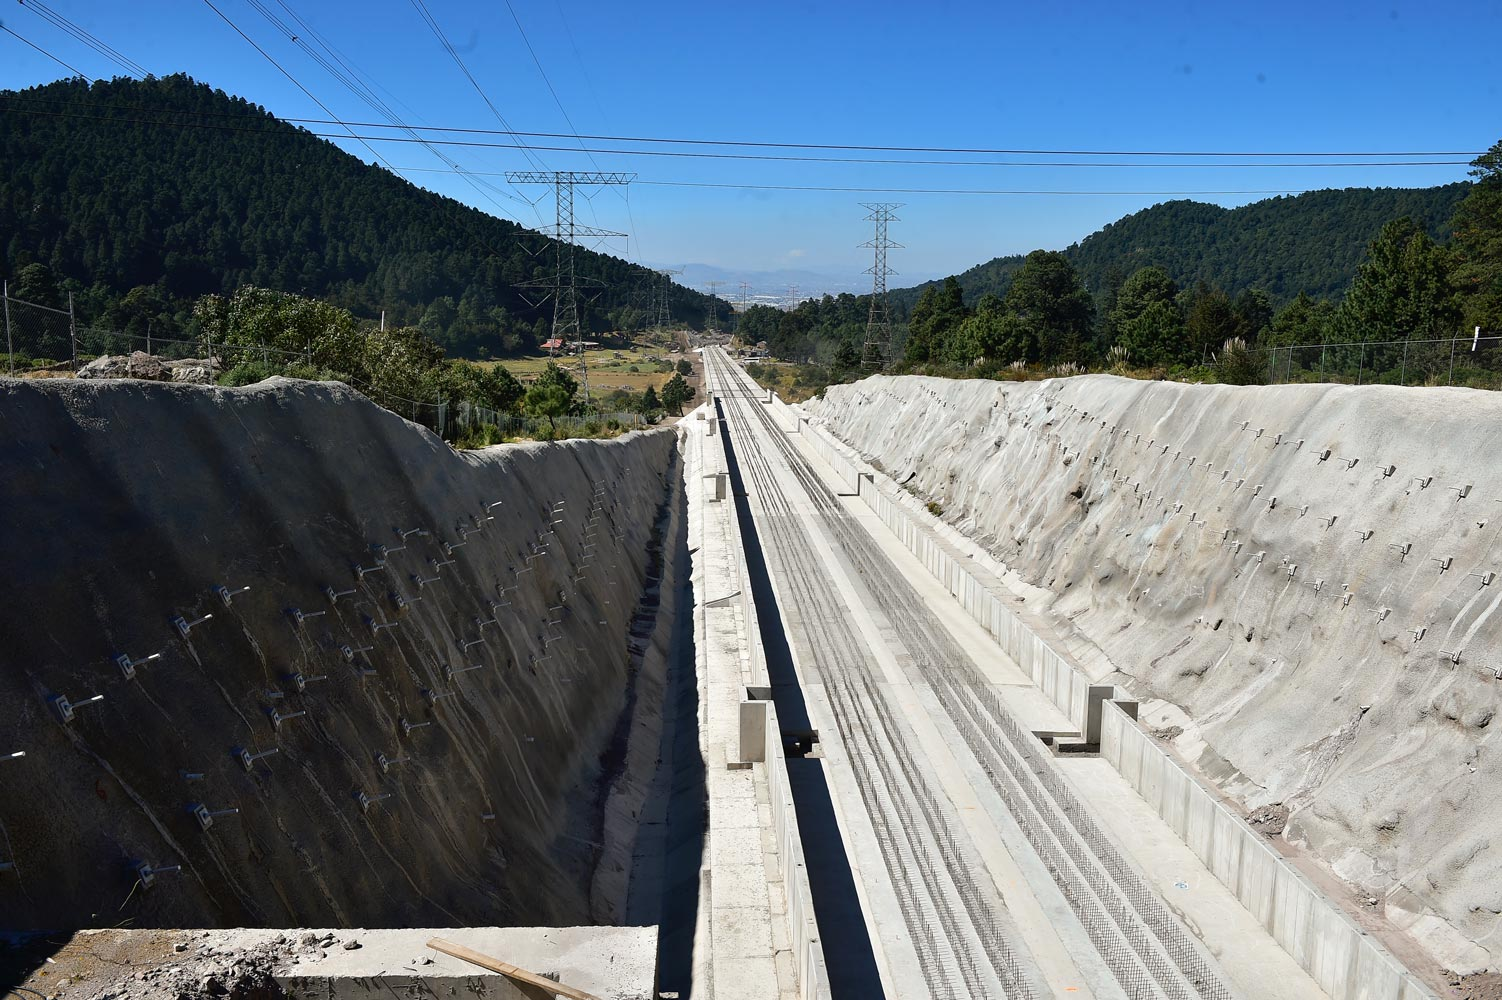 Va gobierno federal por 2 mil km de vías para trenes modernos